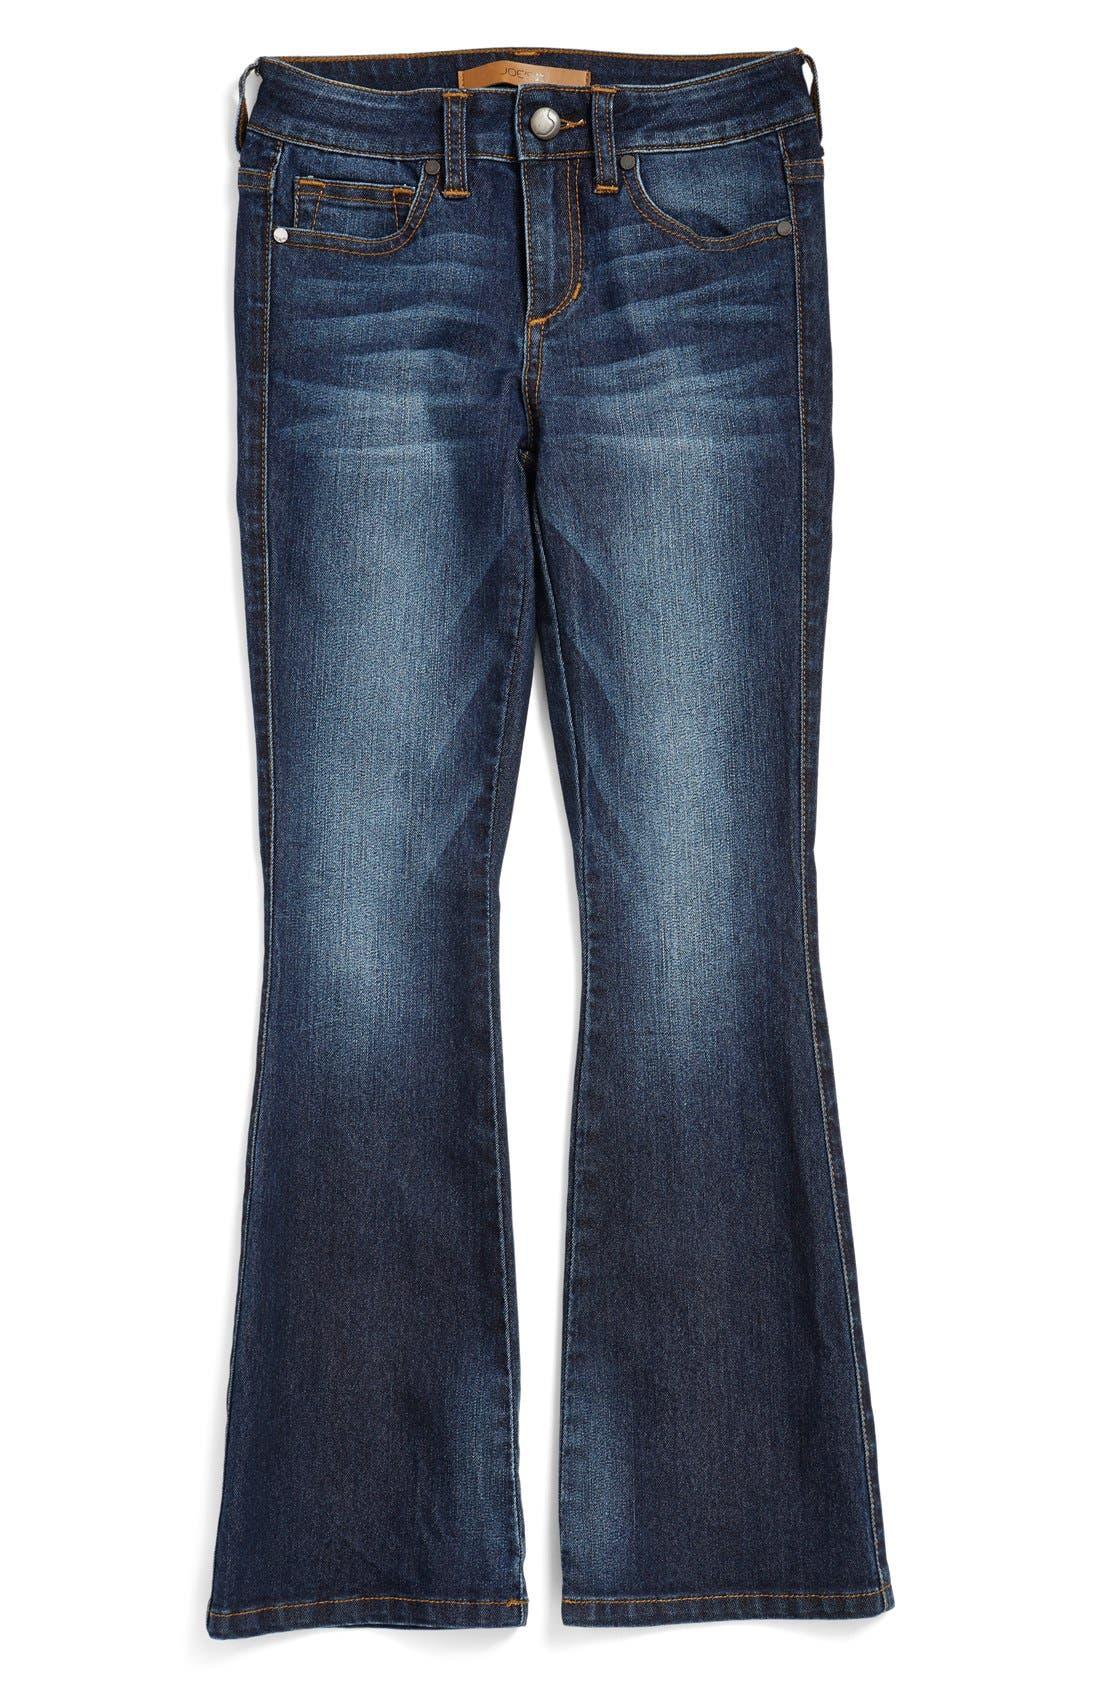 'Samantha' Flare Jeans,                             Alternate thumbnail 3, color,                             427